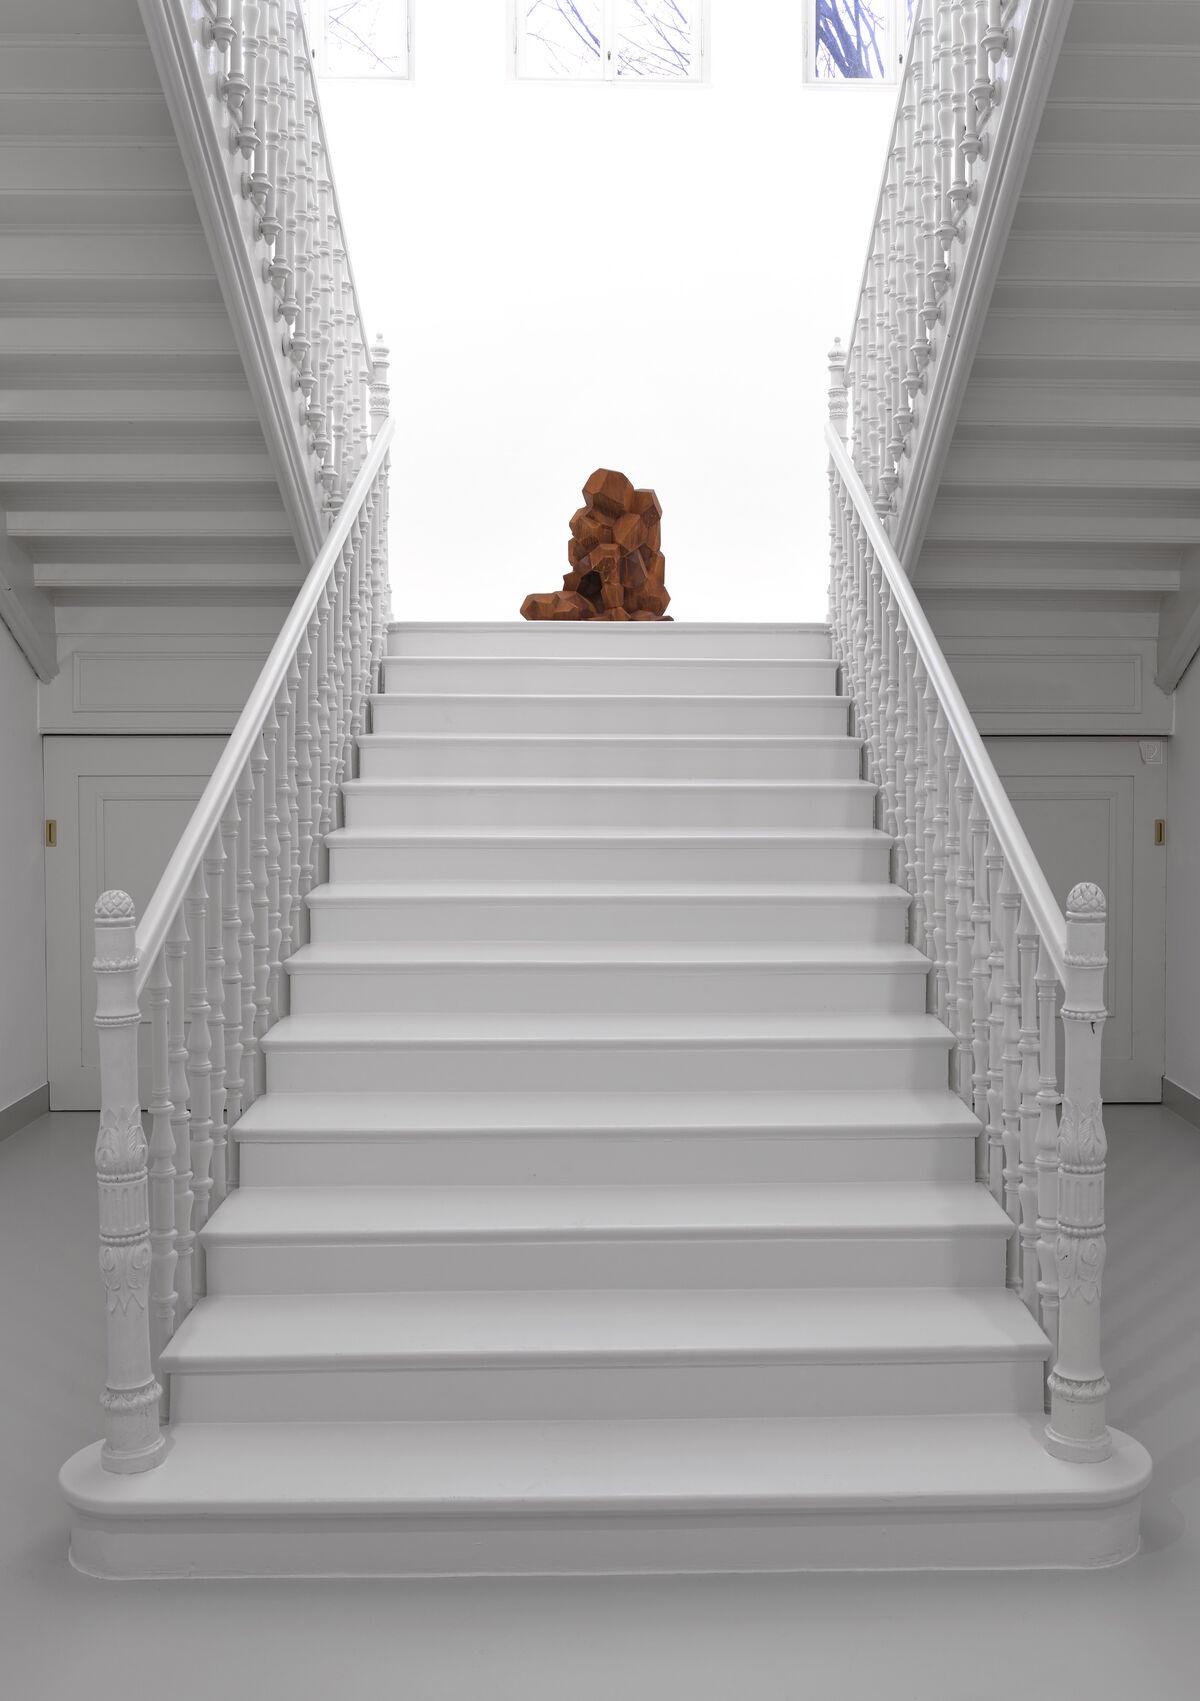 "Installation view of Antony Gormley, ""Earth Body,"" at Galerie Thaddaeus Ropac, Villa Kast, Salzburg, 2018. Photo by Ulrich Ghezzi. Courtesy of Galerie Thaddaeus Ropac."